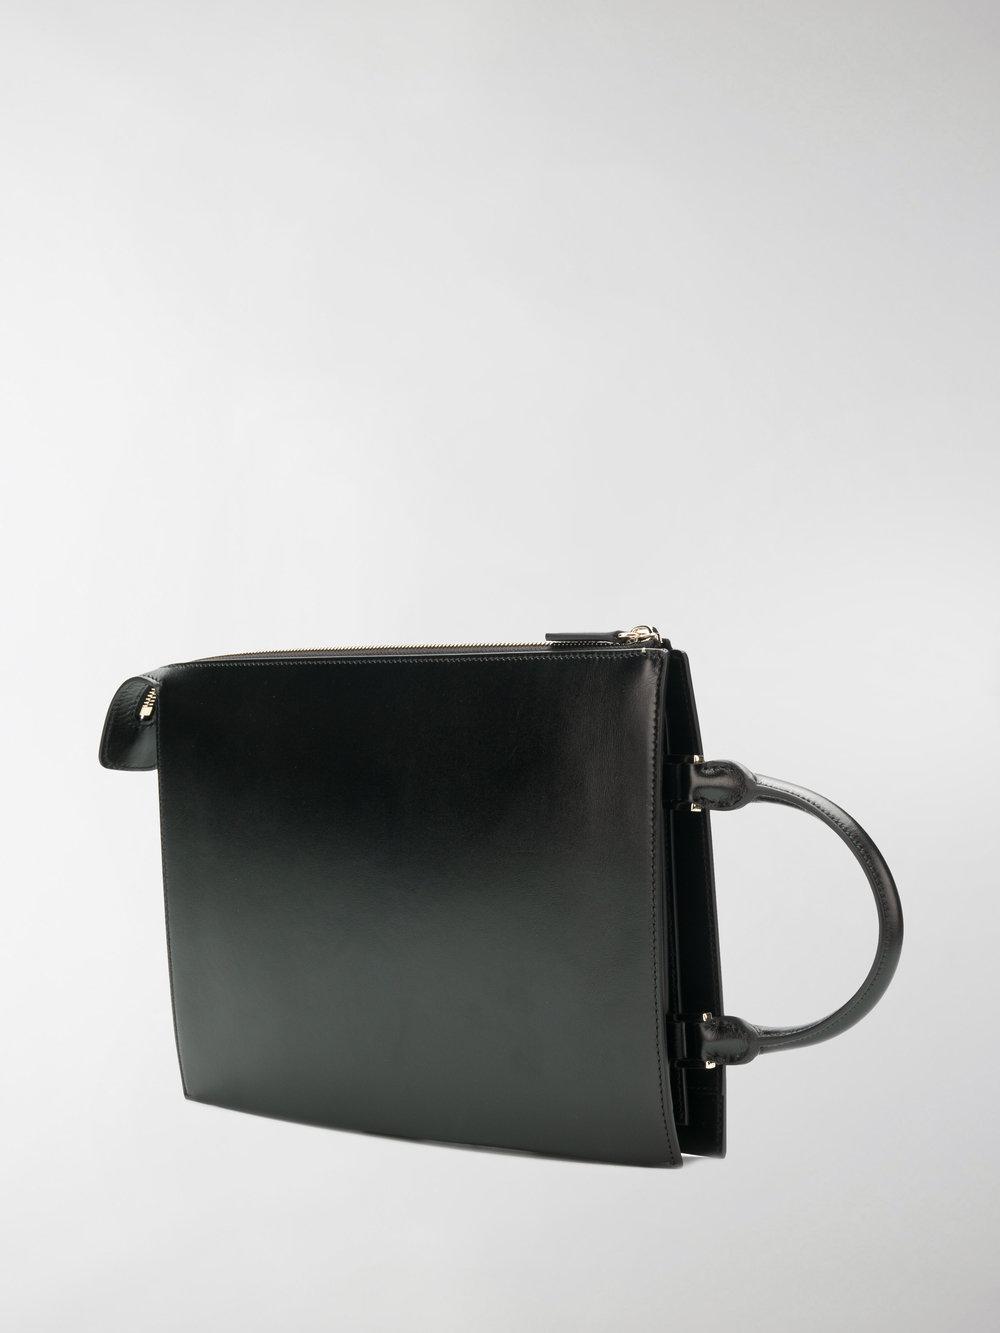 Jil Sander Leather Medium Crossbody Tote in Black